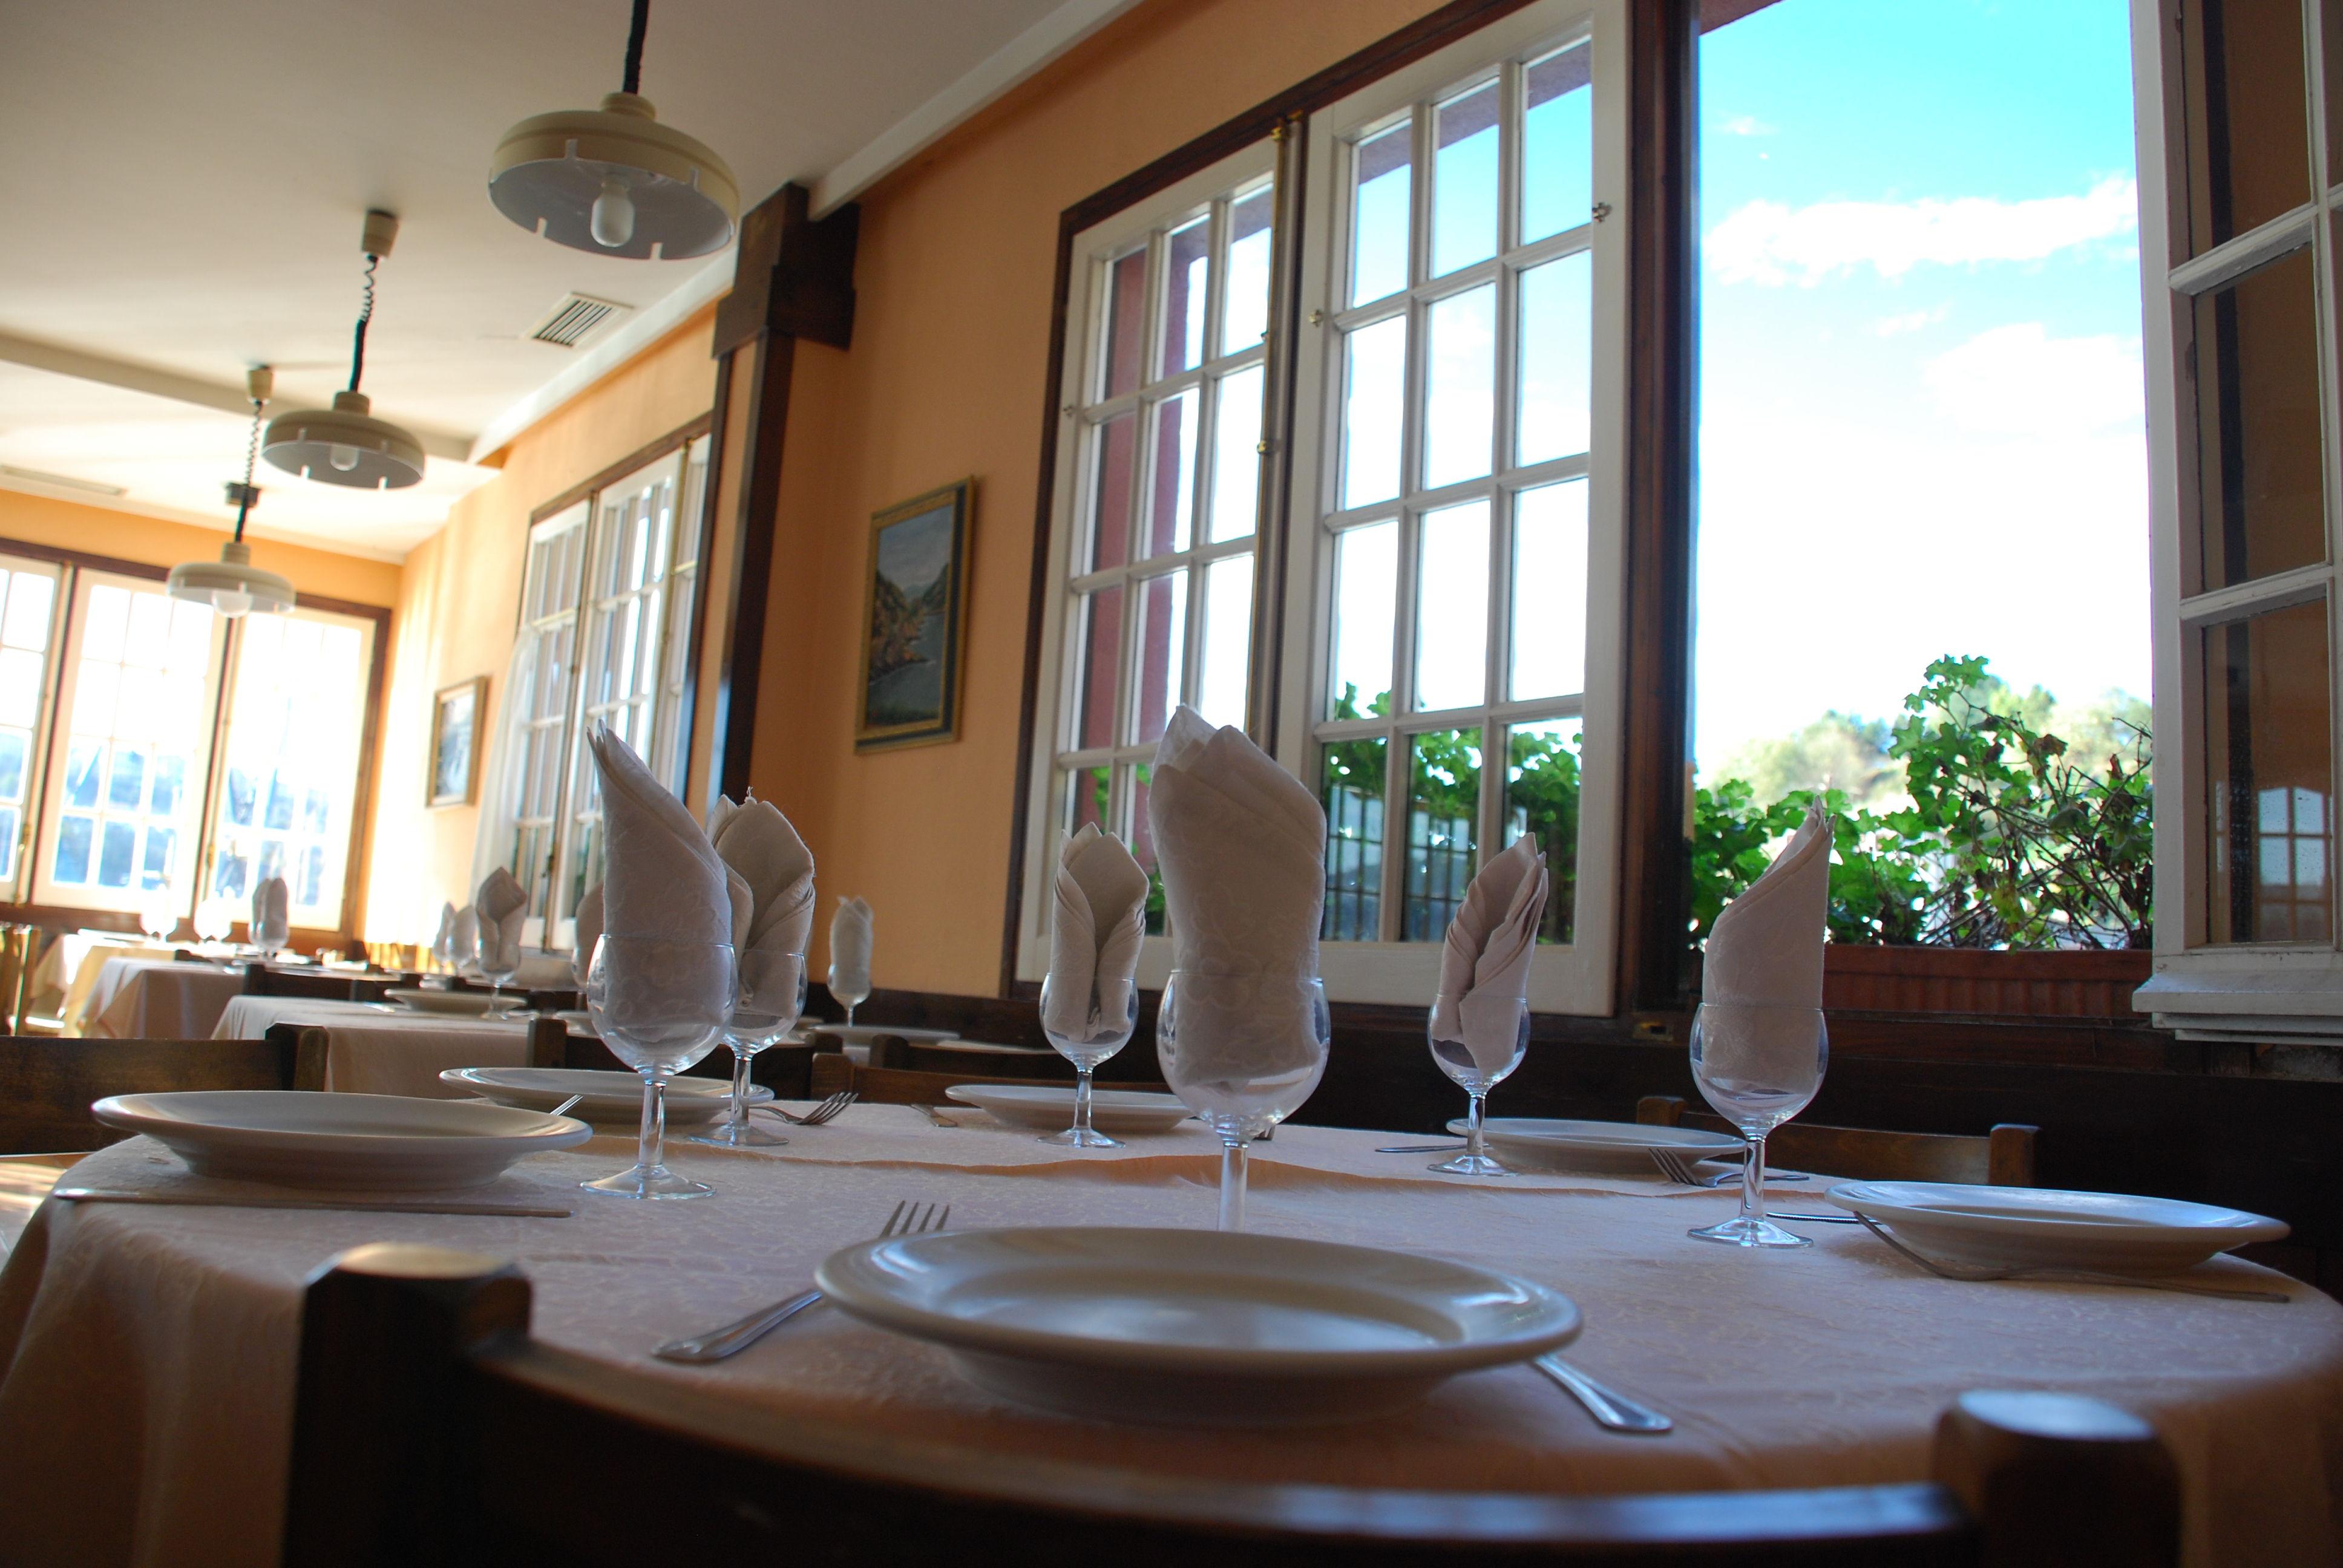 Foto 6 de Cocina vasca en Pasajes San Juan | Restaurante Nicolasa